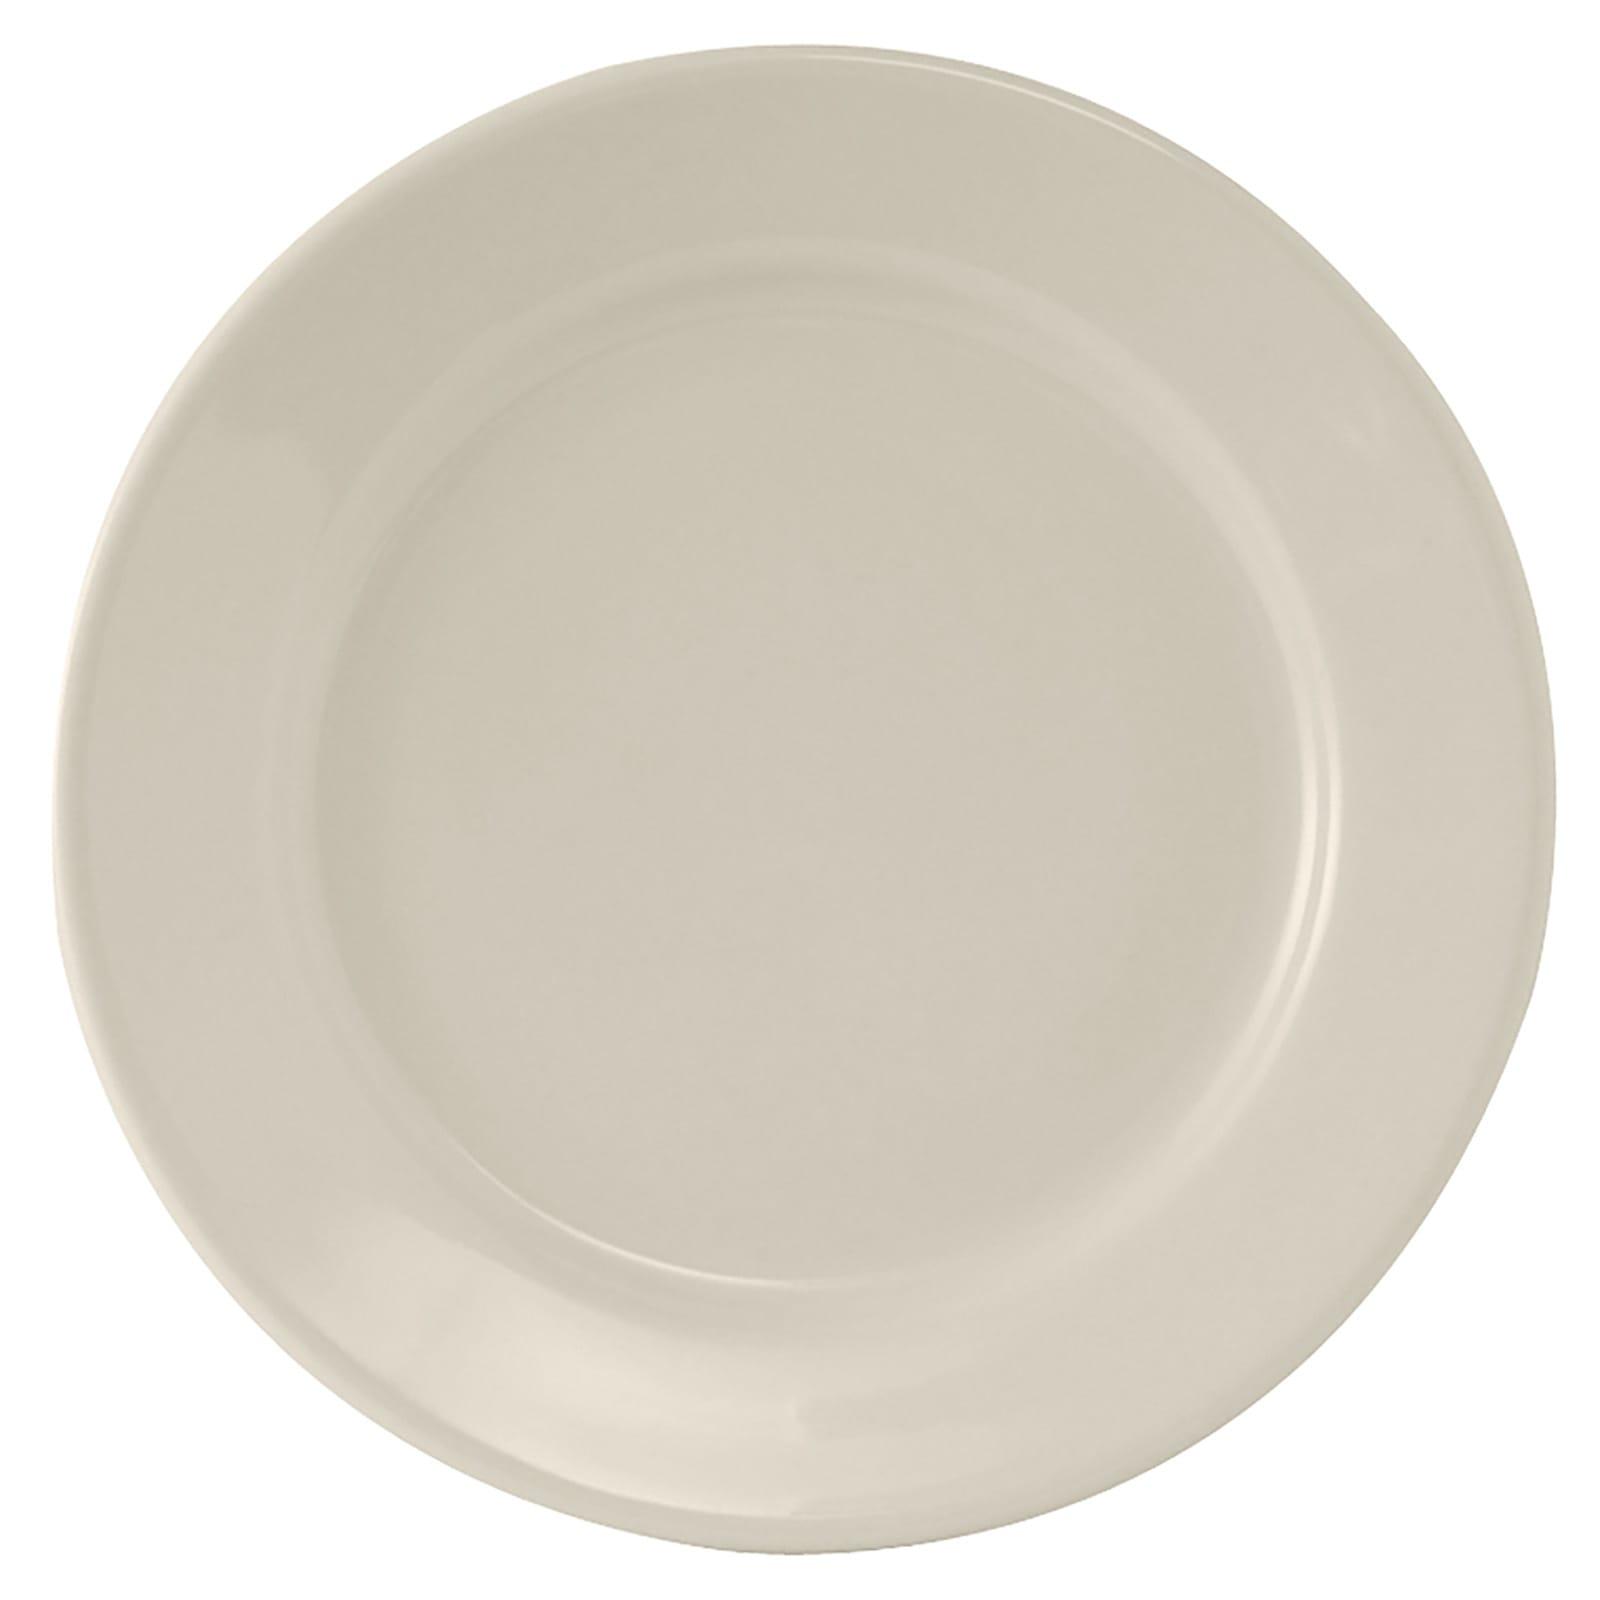 "Tuxton TRE-051 11.13"" Round Reno Plate - Ceramic,  American White"